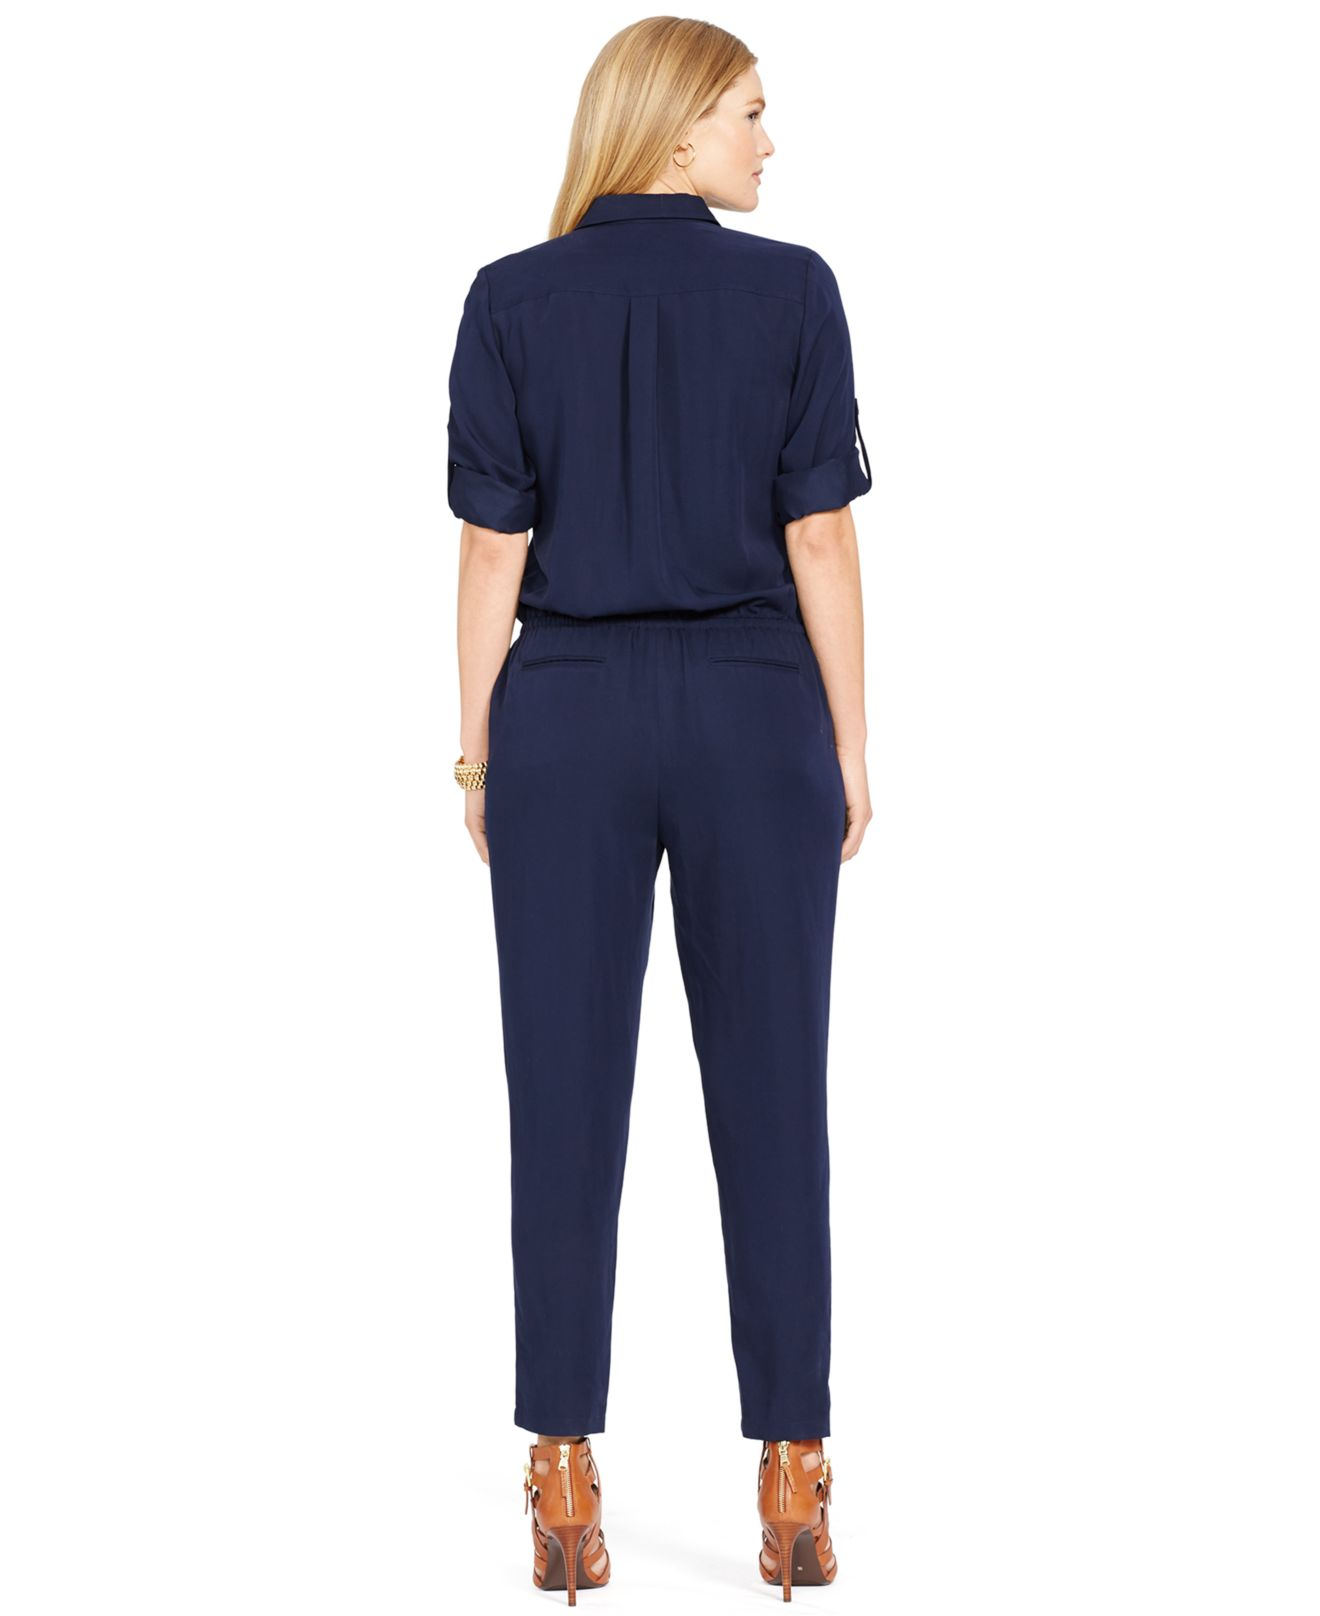 fffd7c7448b Lyst - Lauren by Ralph Lauren Plus Size Long-Sleeve Jumpsuit in Blue